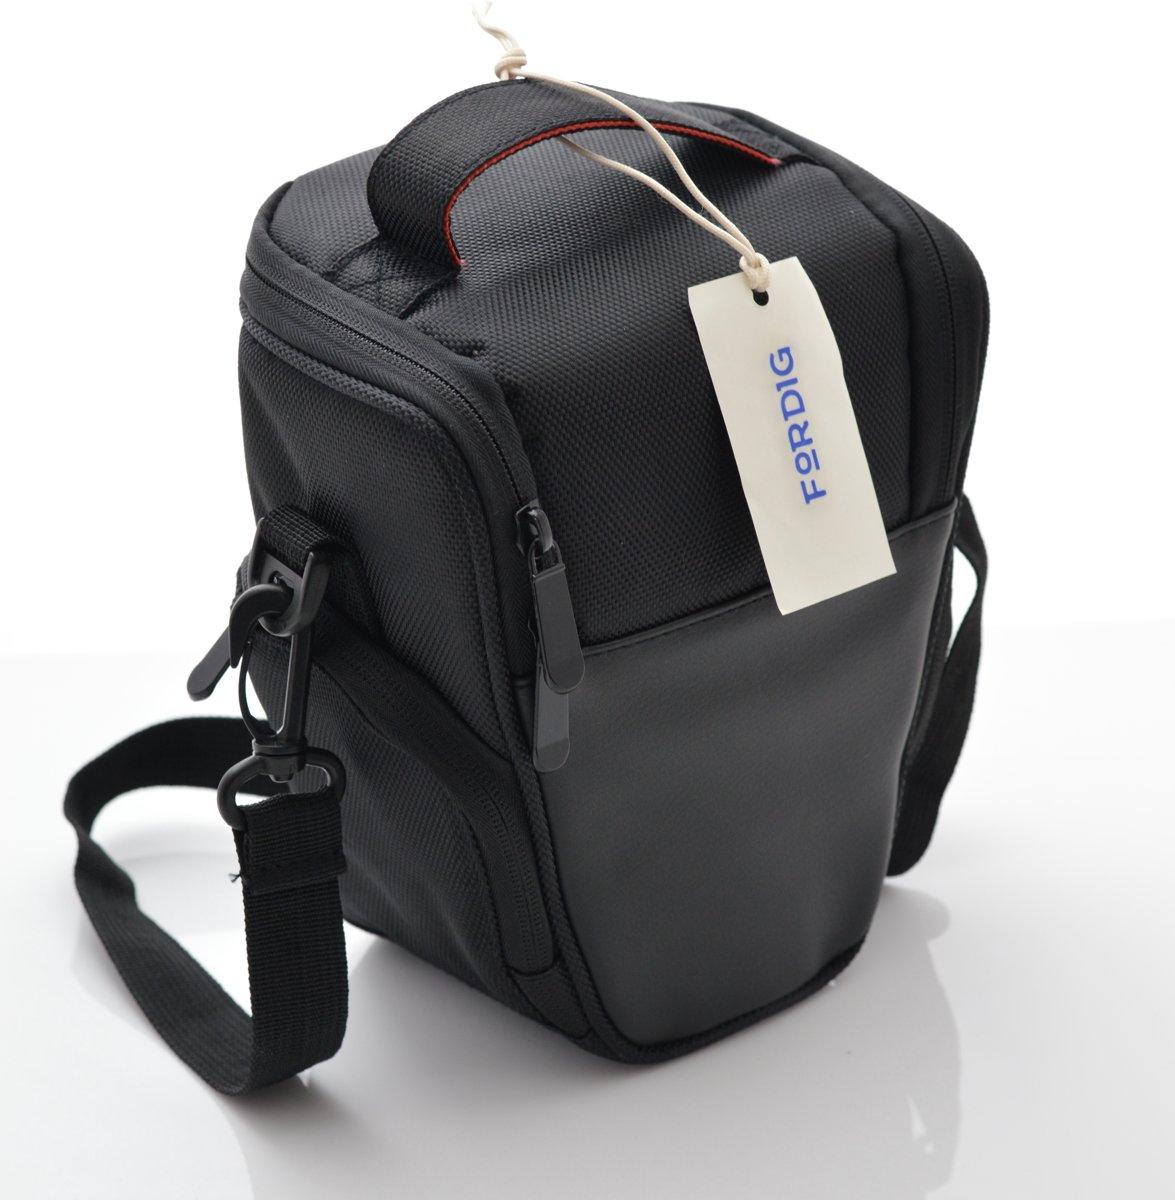 8f39088d0f8 bol.com | Cameratas waterdicht DSLR - Camera tas geschikt voor Nikon Canon  - Camera rugzak